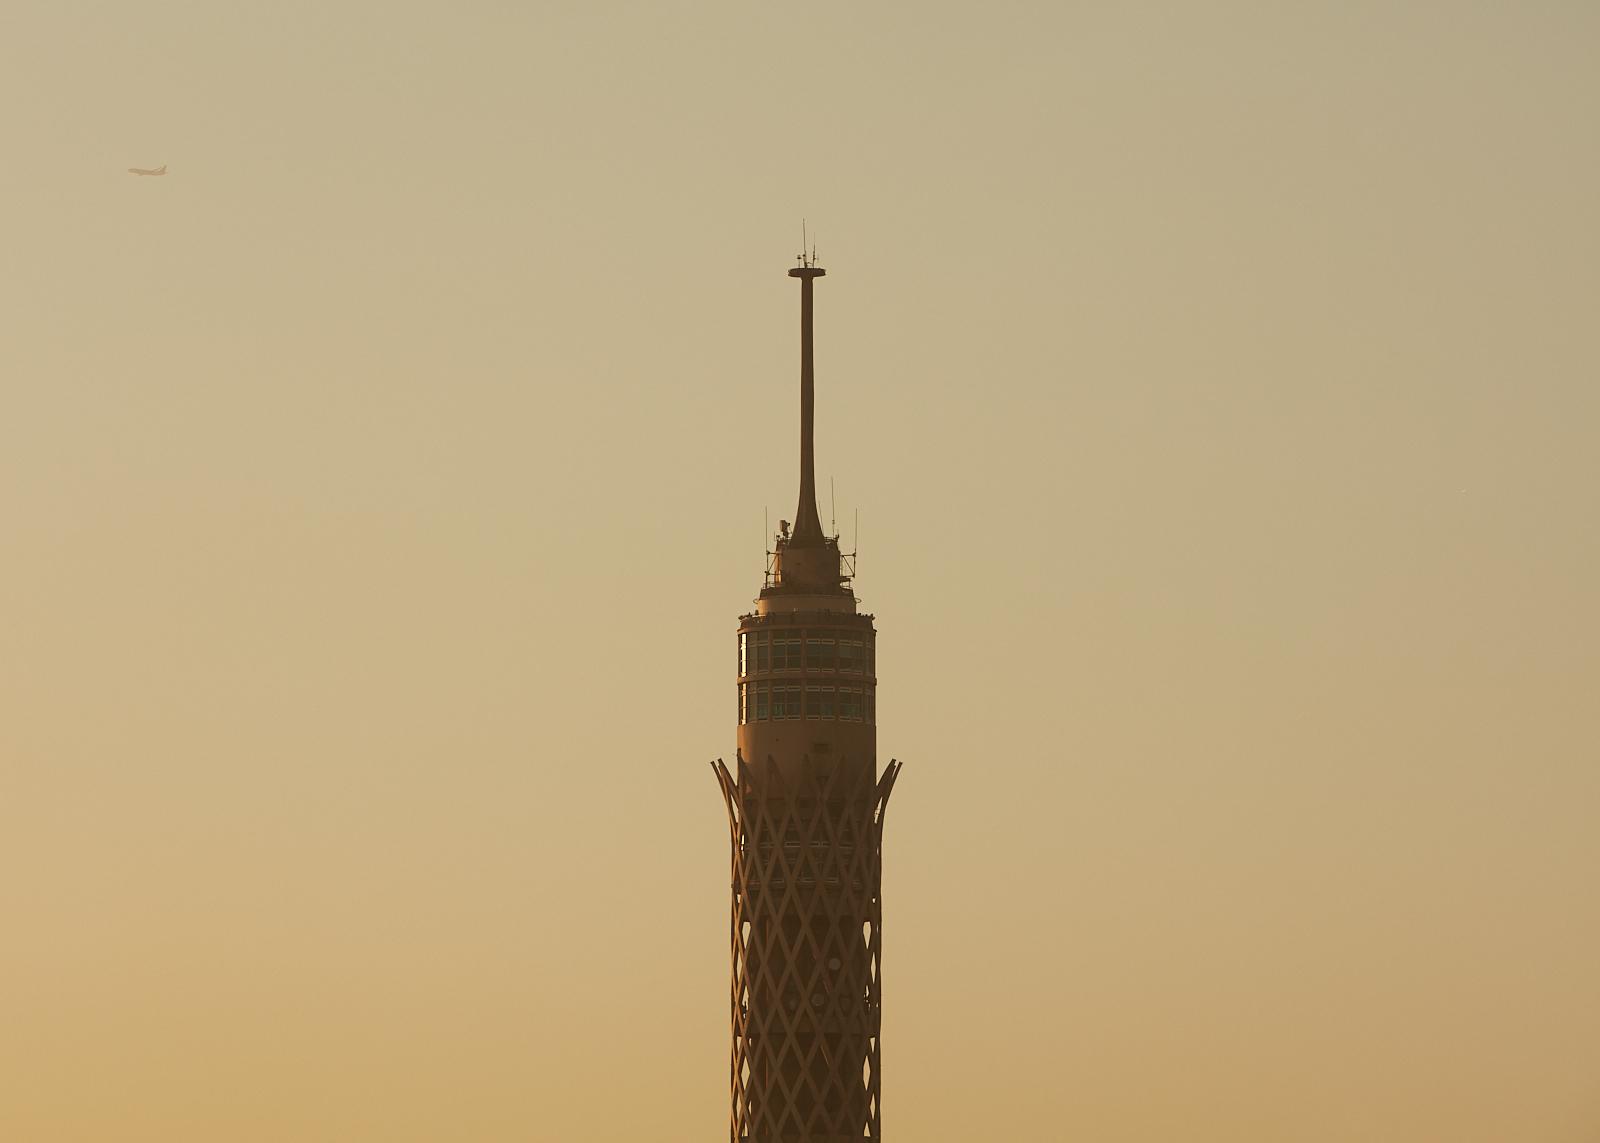 IDB_Egypt_160817_1042.jpg